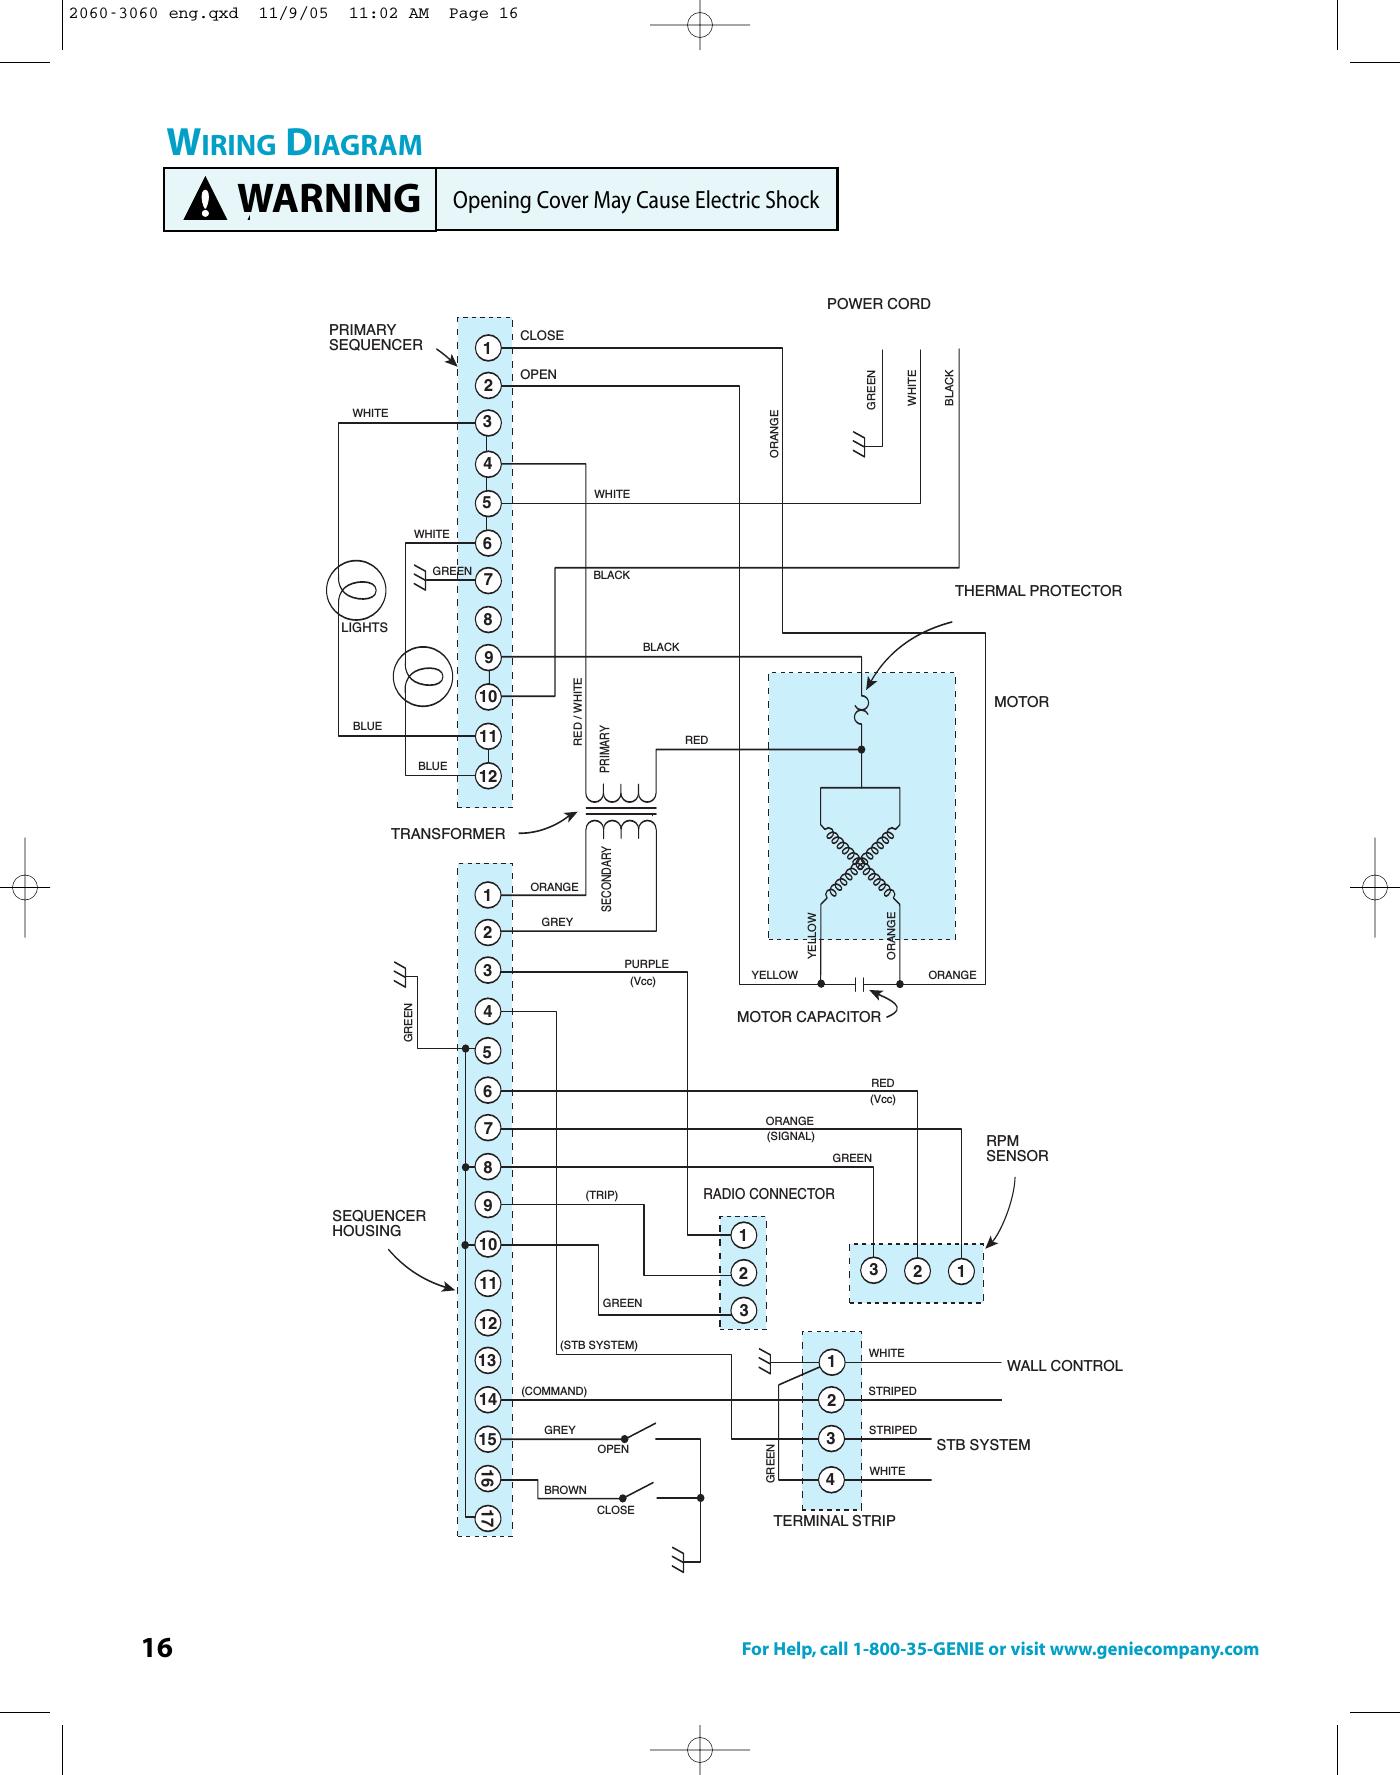 [DIAGRAM_5FD]  WV_5476] Garage Door Opener Genie 3060 Wiring Diagram Free Download Wiring  Free Diagram | Wiring Diagram For A Genie Garage Door Opener |  | Cajos Omit Greas Benkeme Mohammedshrine Librar Wiring 101